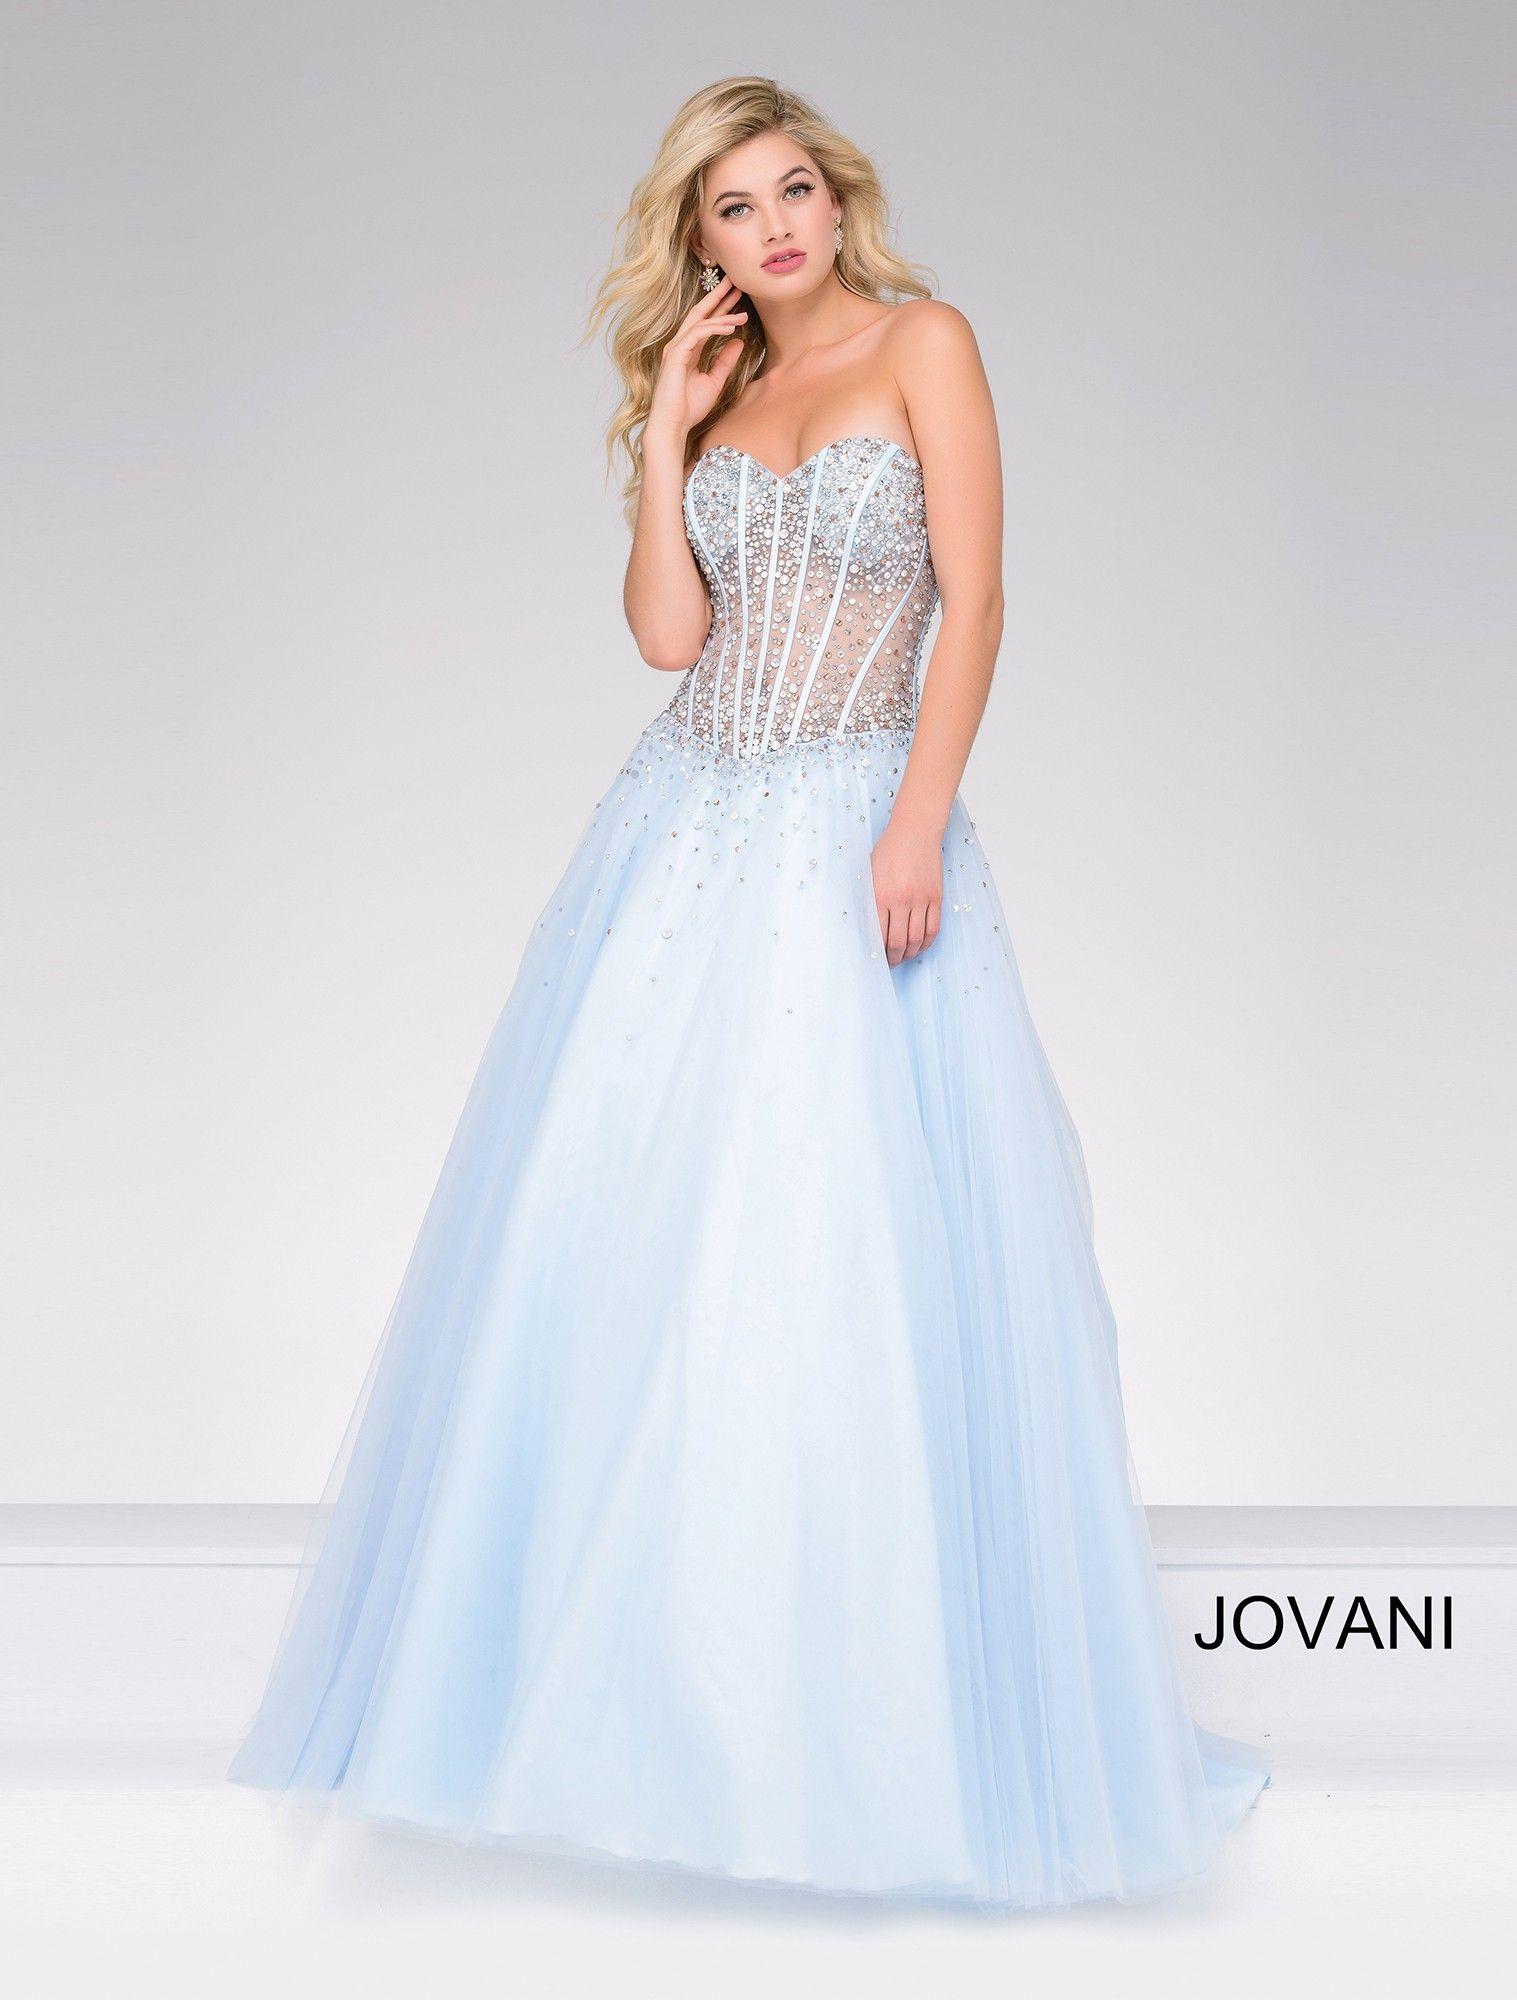 2052672d3163 Jovani 47131 Jeweled Illusion Corset Ball Gown | 2017 Prom Dresses ...